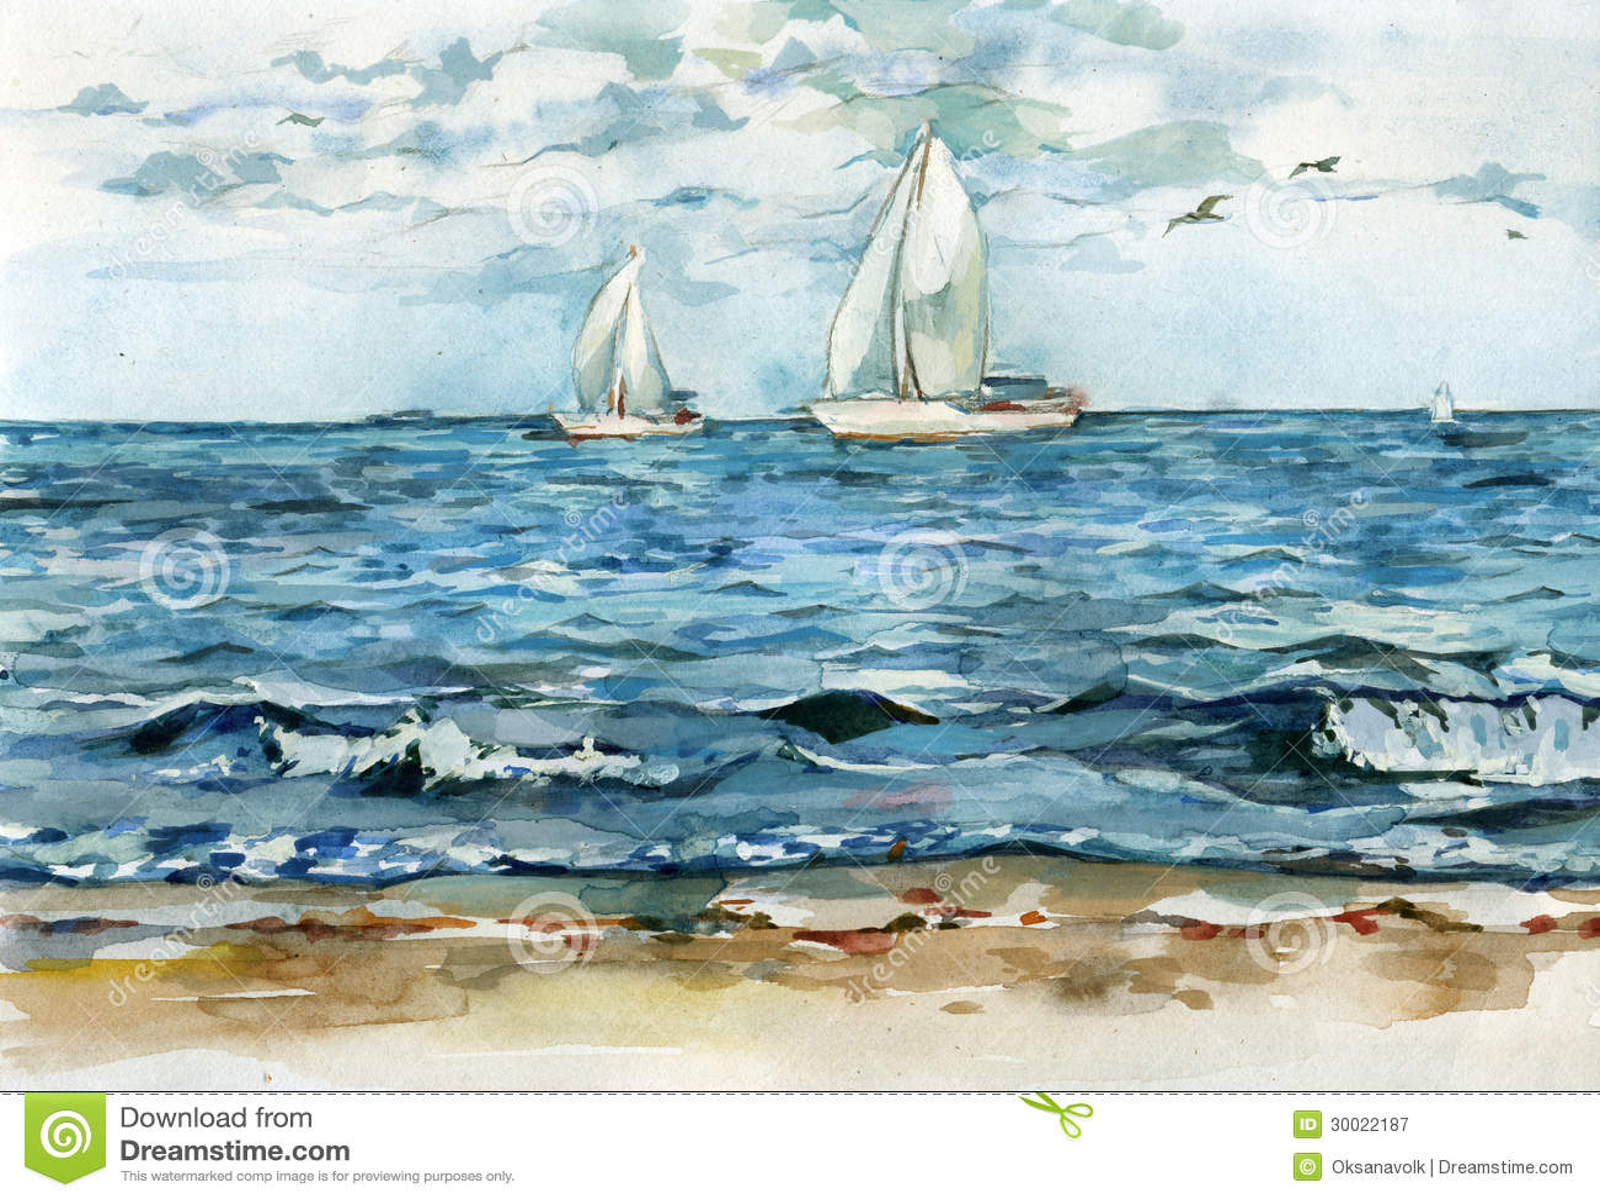 Jachten driftind in de stille blauwe overzeese waterverfillustratie